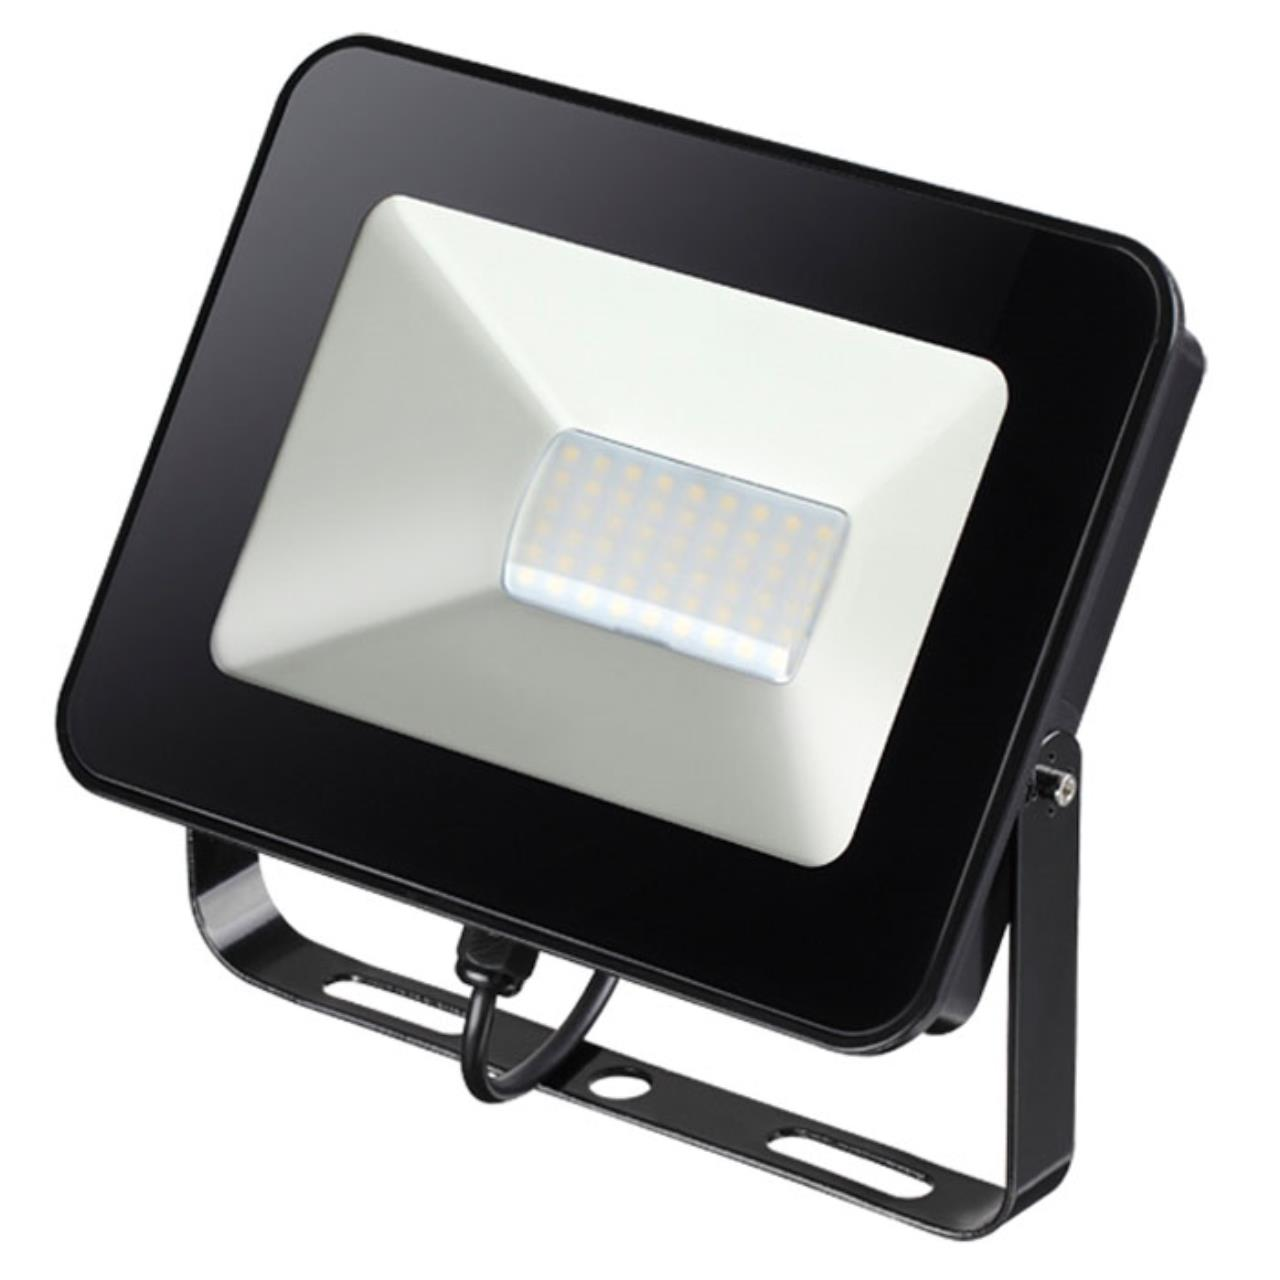 357529 STREET NT18 176 черный Ландшафтный прожектор IP65 LED 4000K 30W 220-240V ARMIN